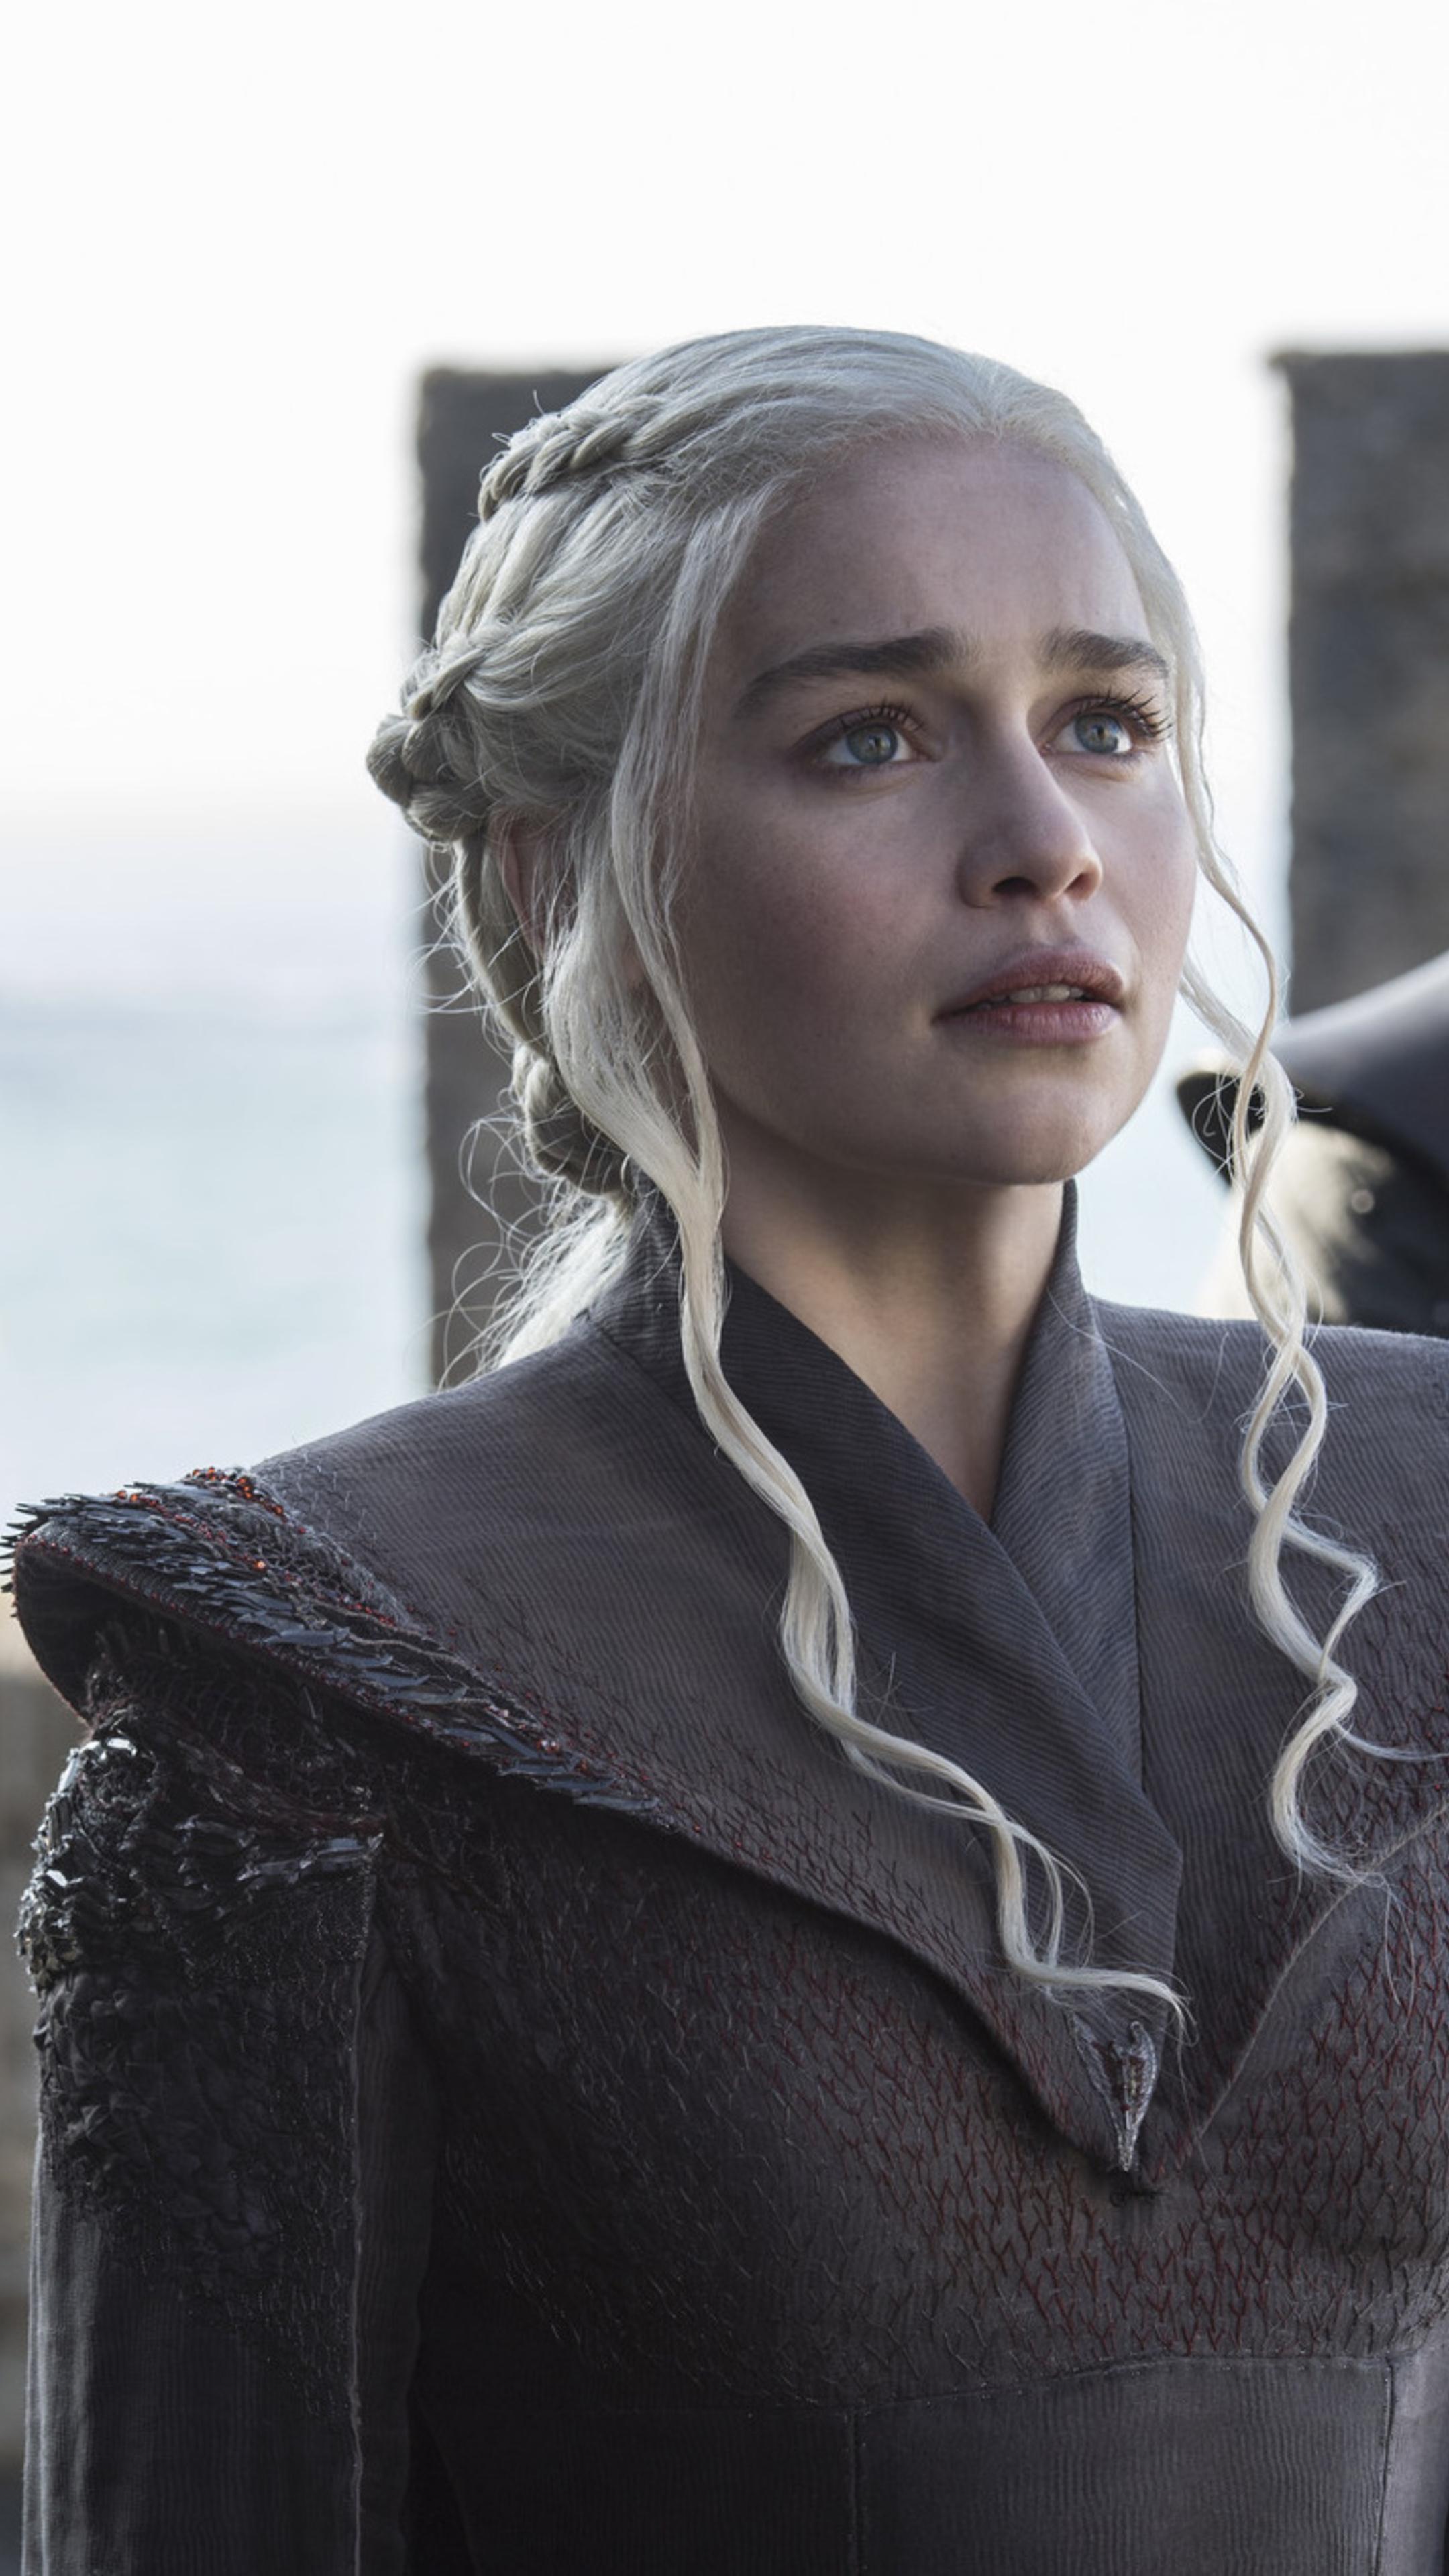 2160x3840 Game Of Thrones Season 7 Daenerys Targaryen Sony ...